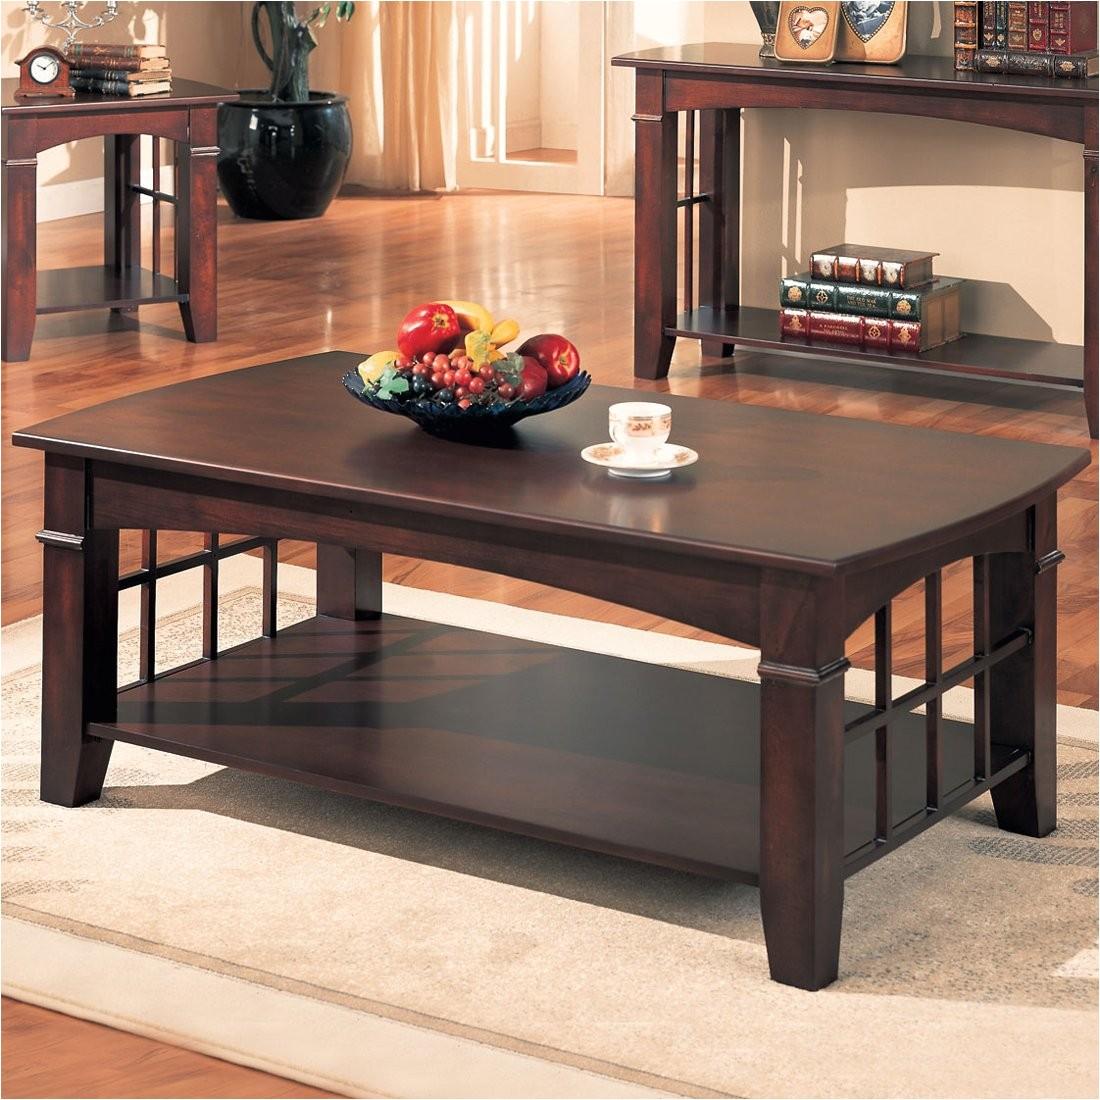 coaster fine furniture locations coaster fine furniture 700008 coffee table atg stores